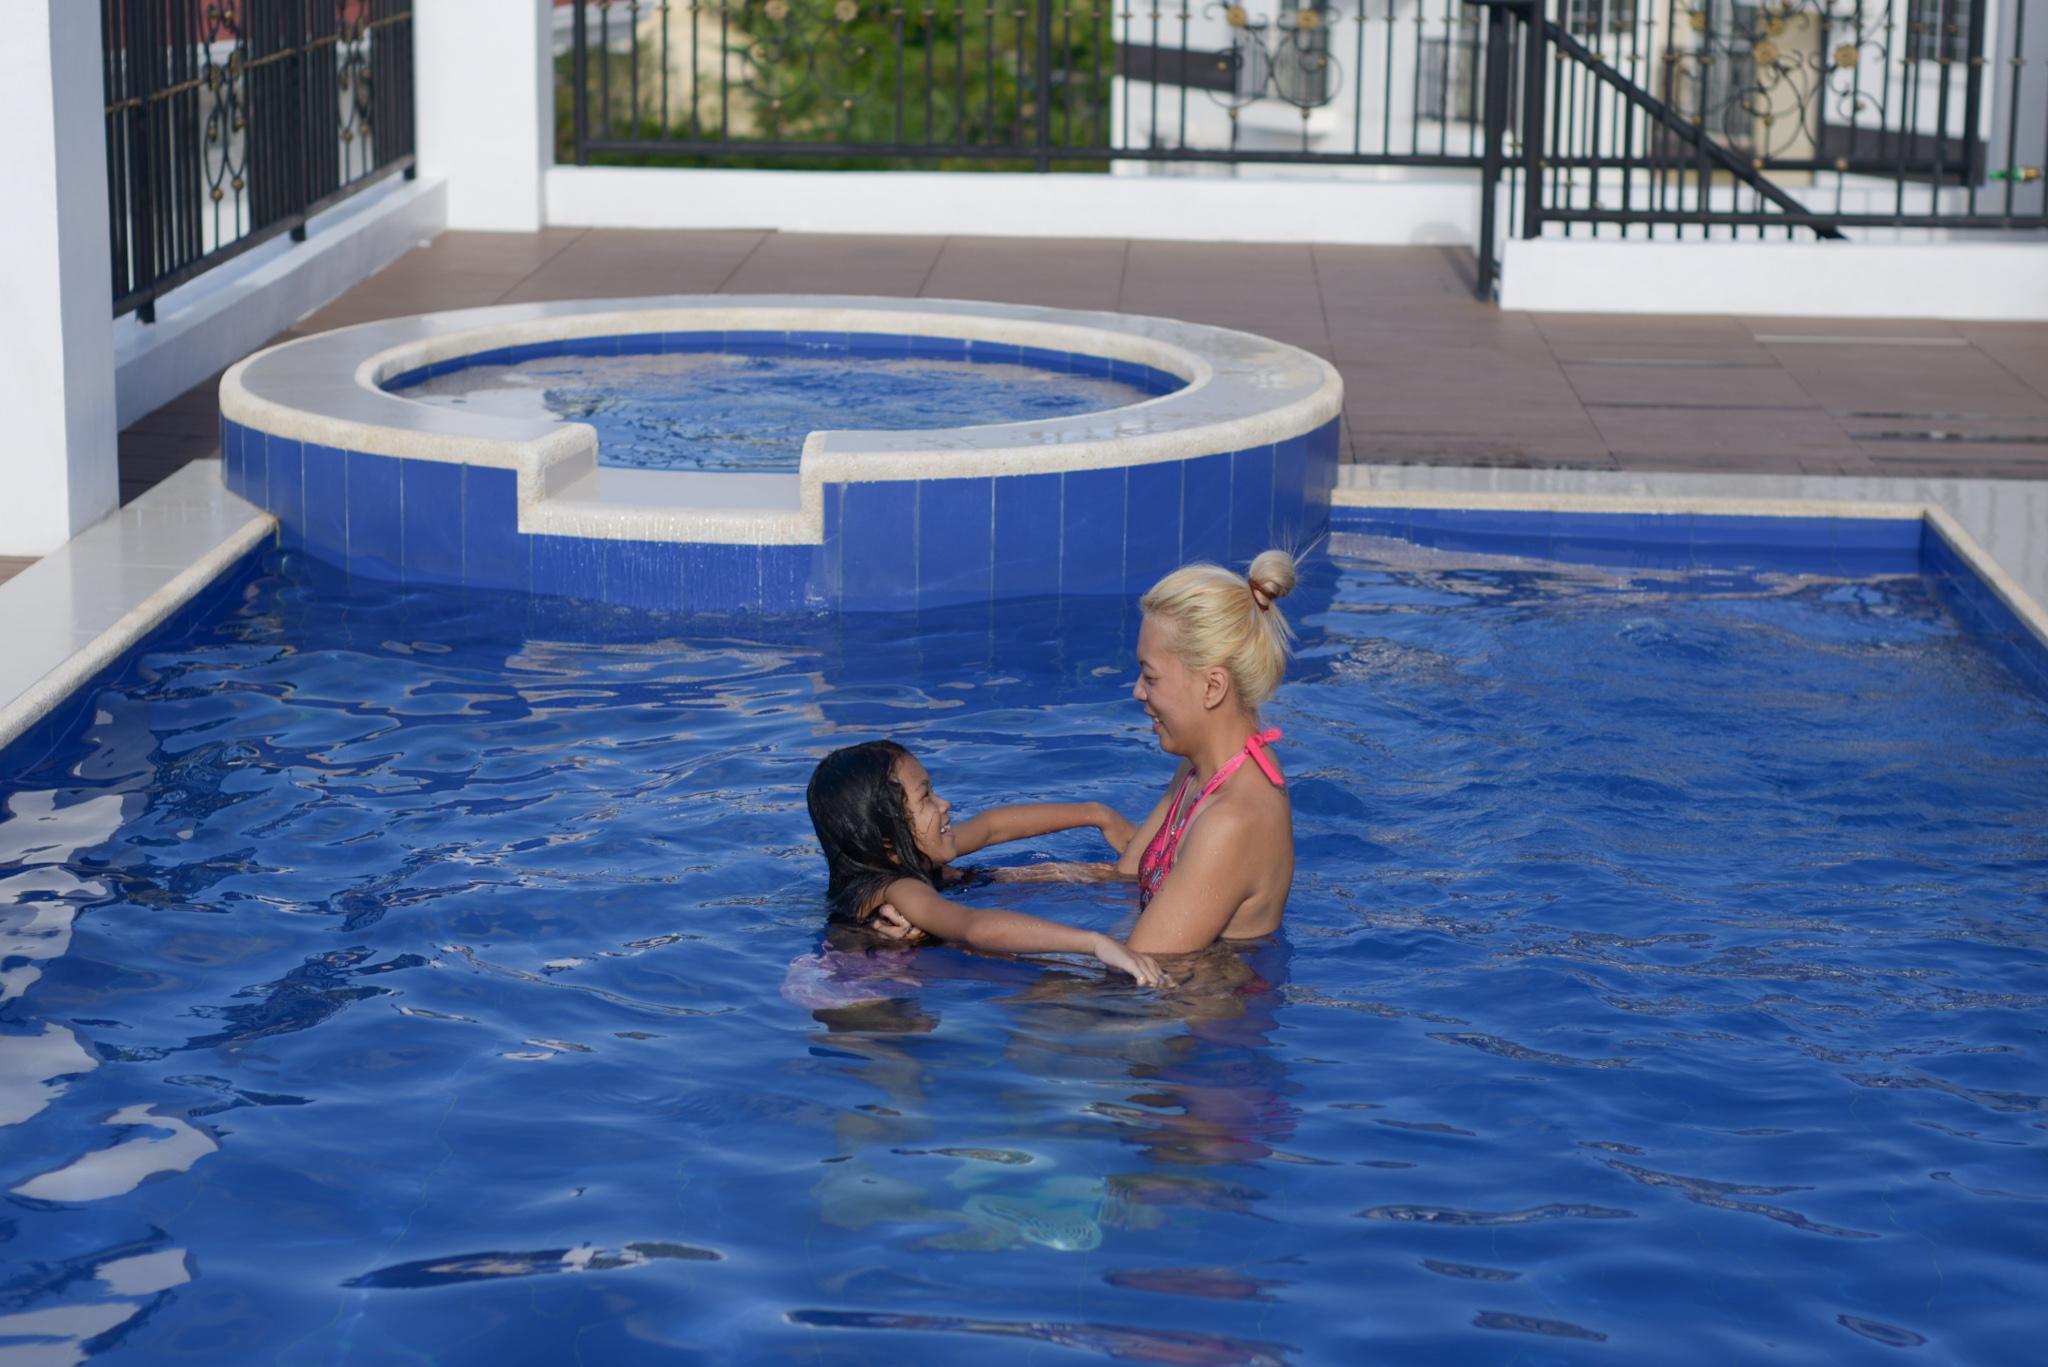 More Worry-Free Days with Joy - Swim time